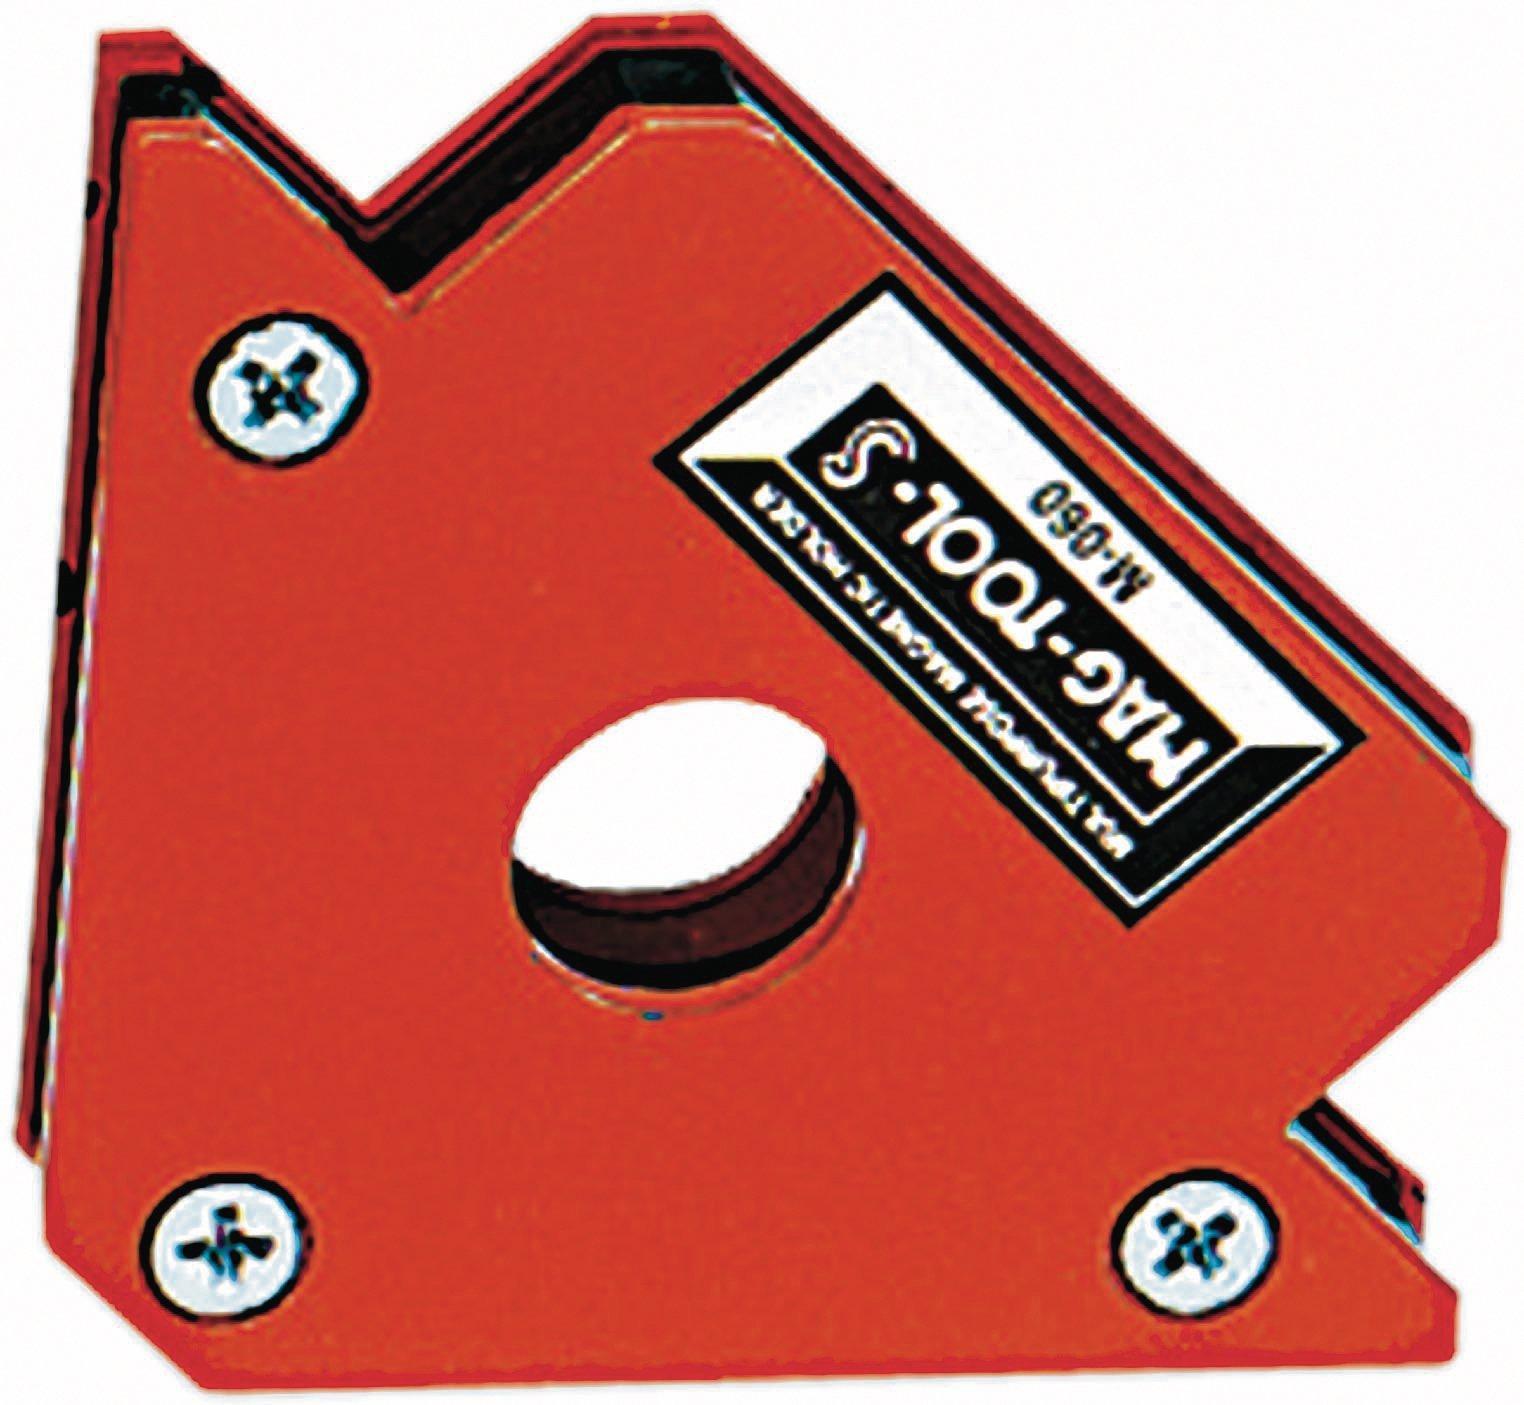 Firepower 1423-1426 Mag Tool Multi-Purpose Magnetic Holder, Large